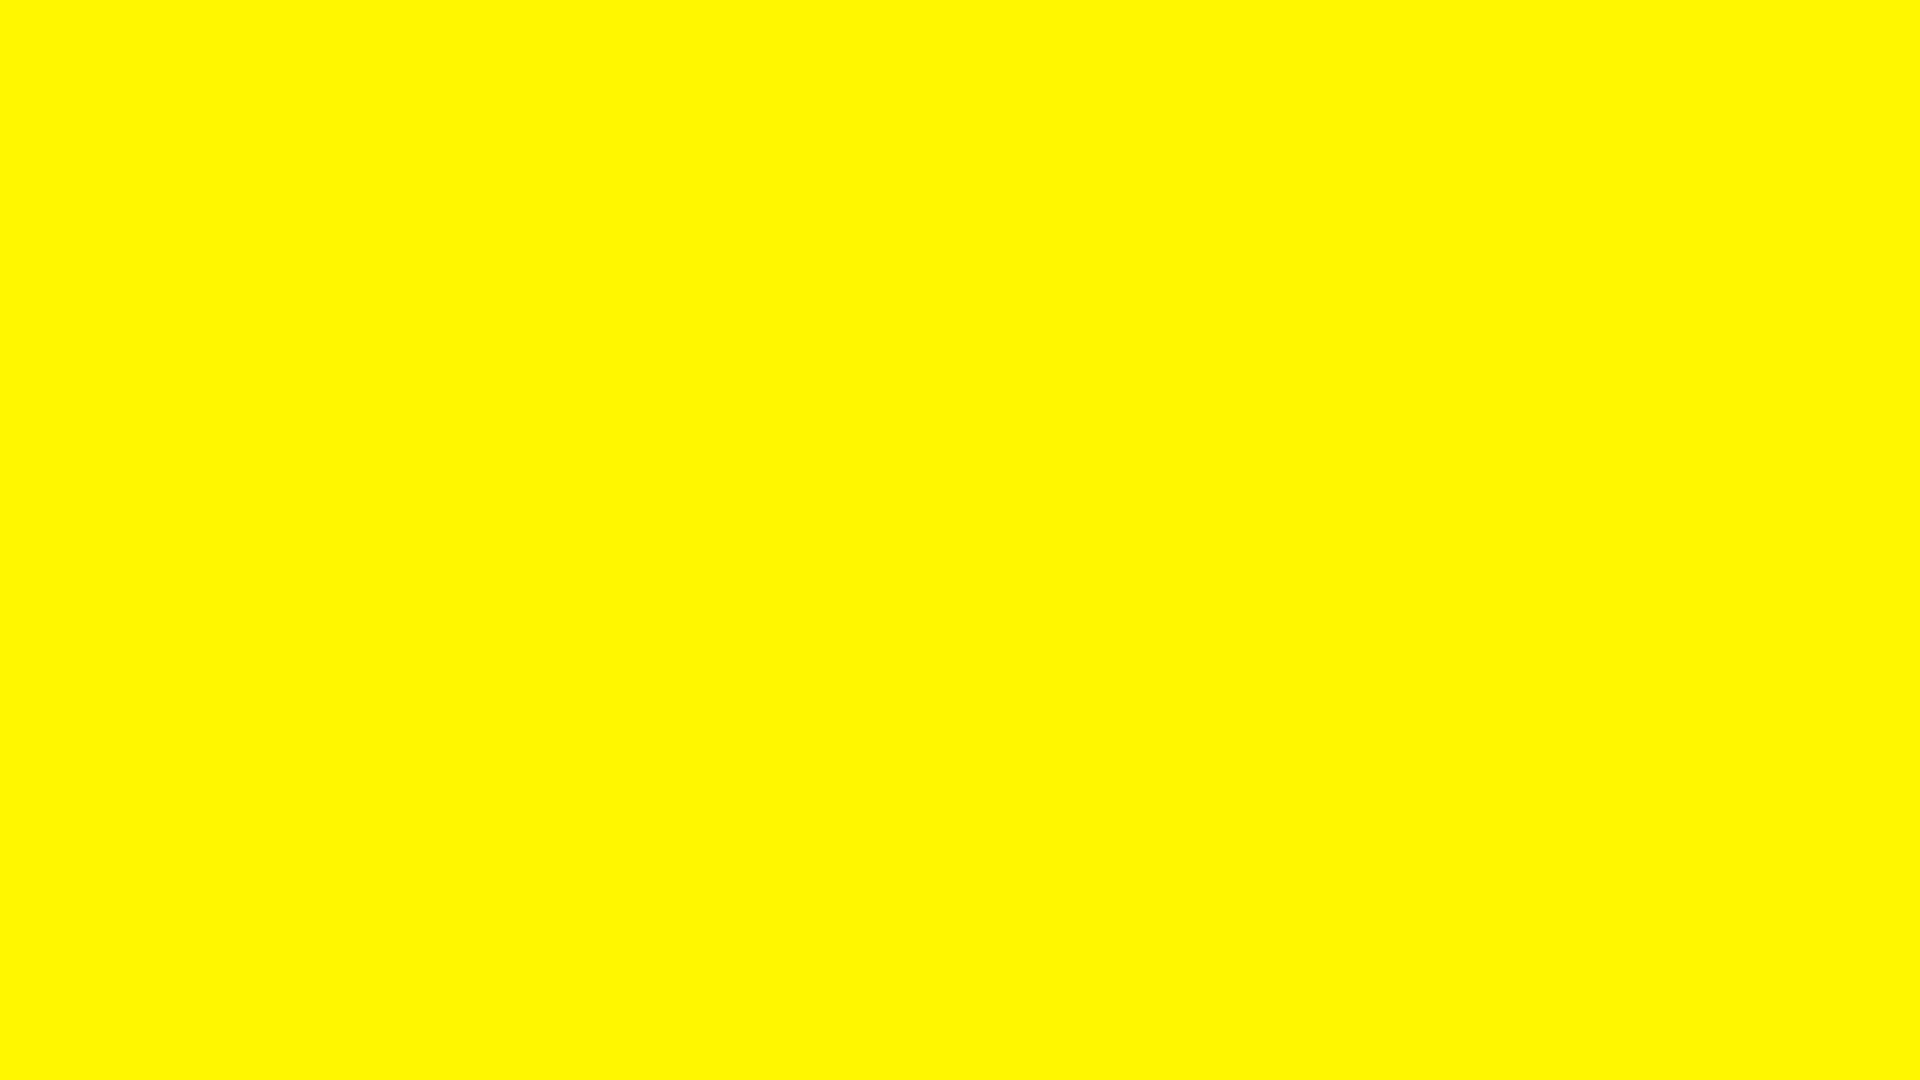 1920x1080 Lemon Solid Color Background